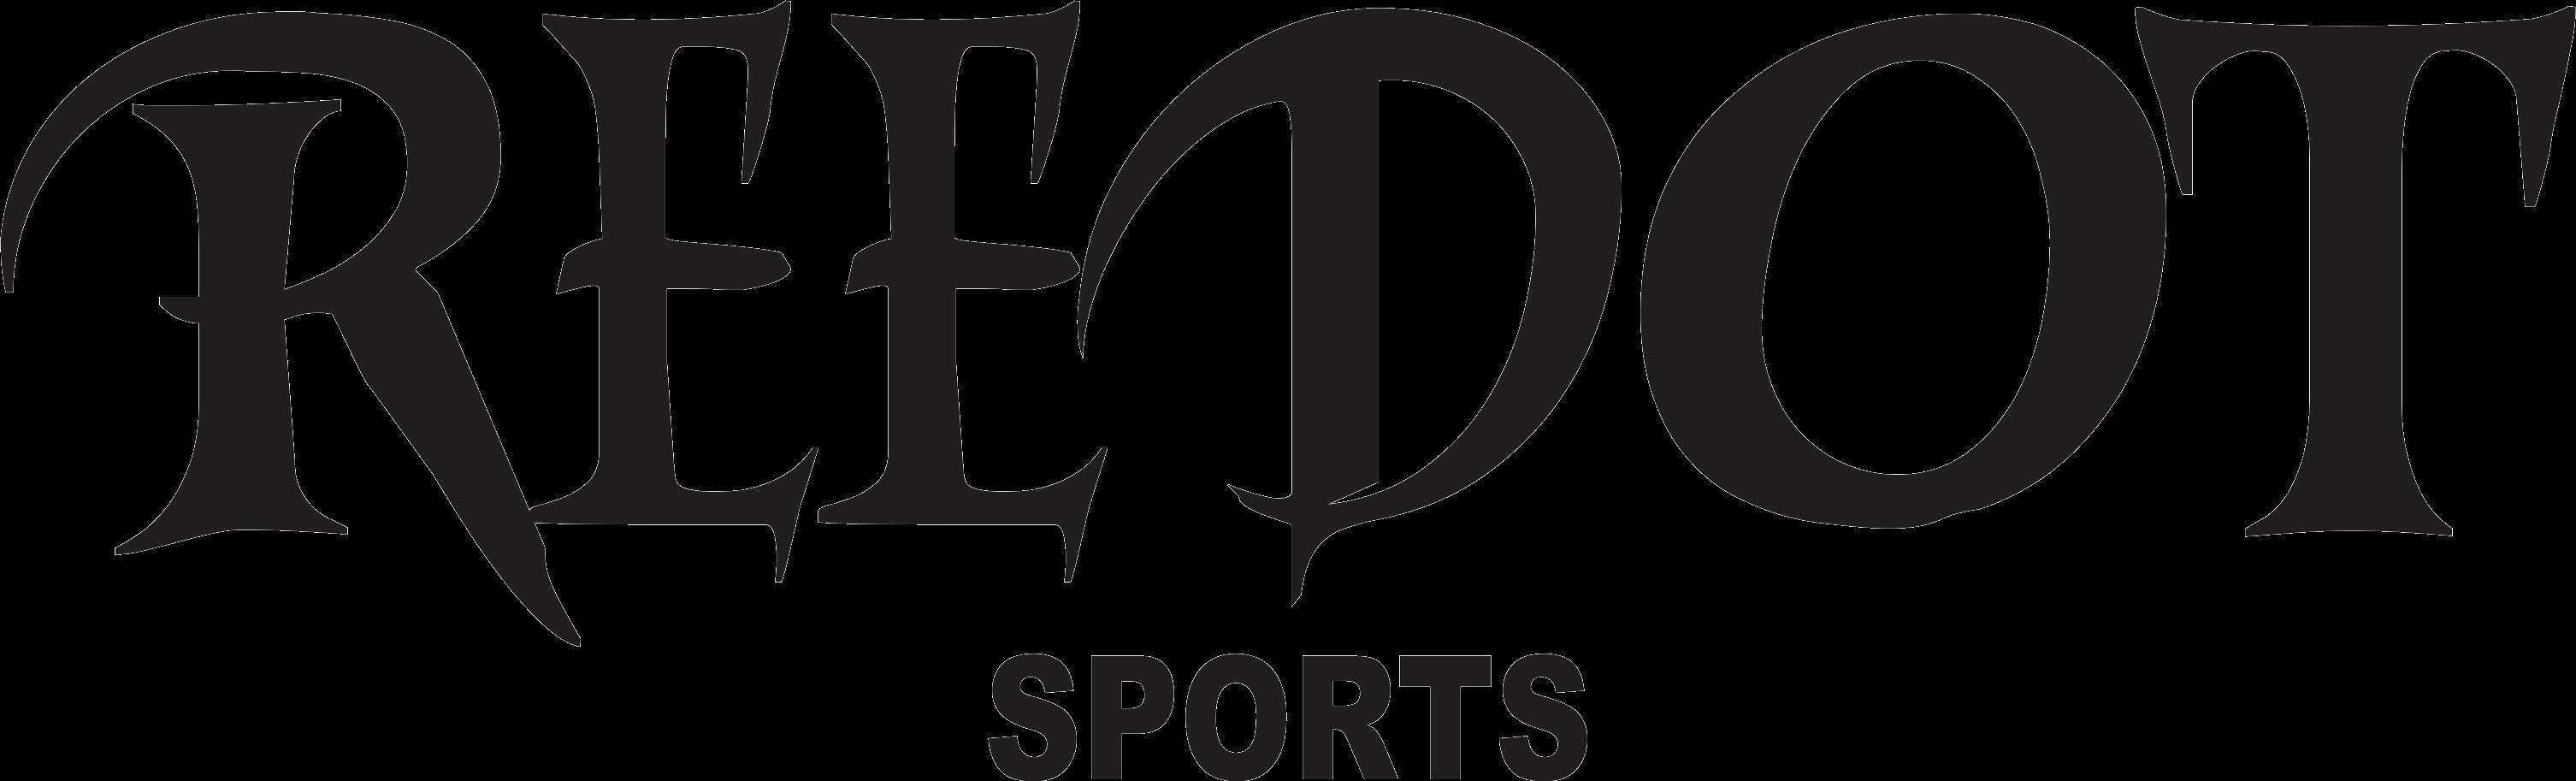 Reedot Sports